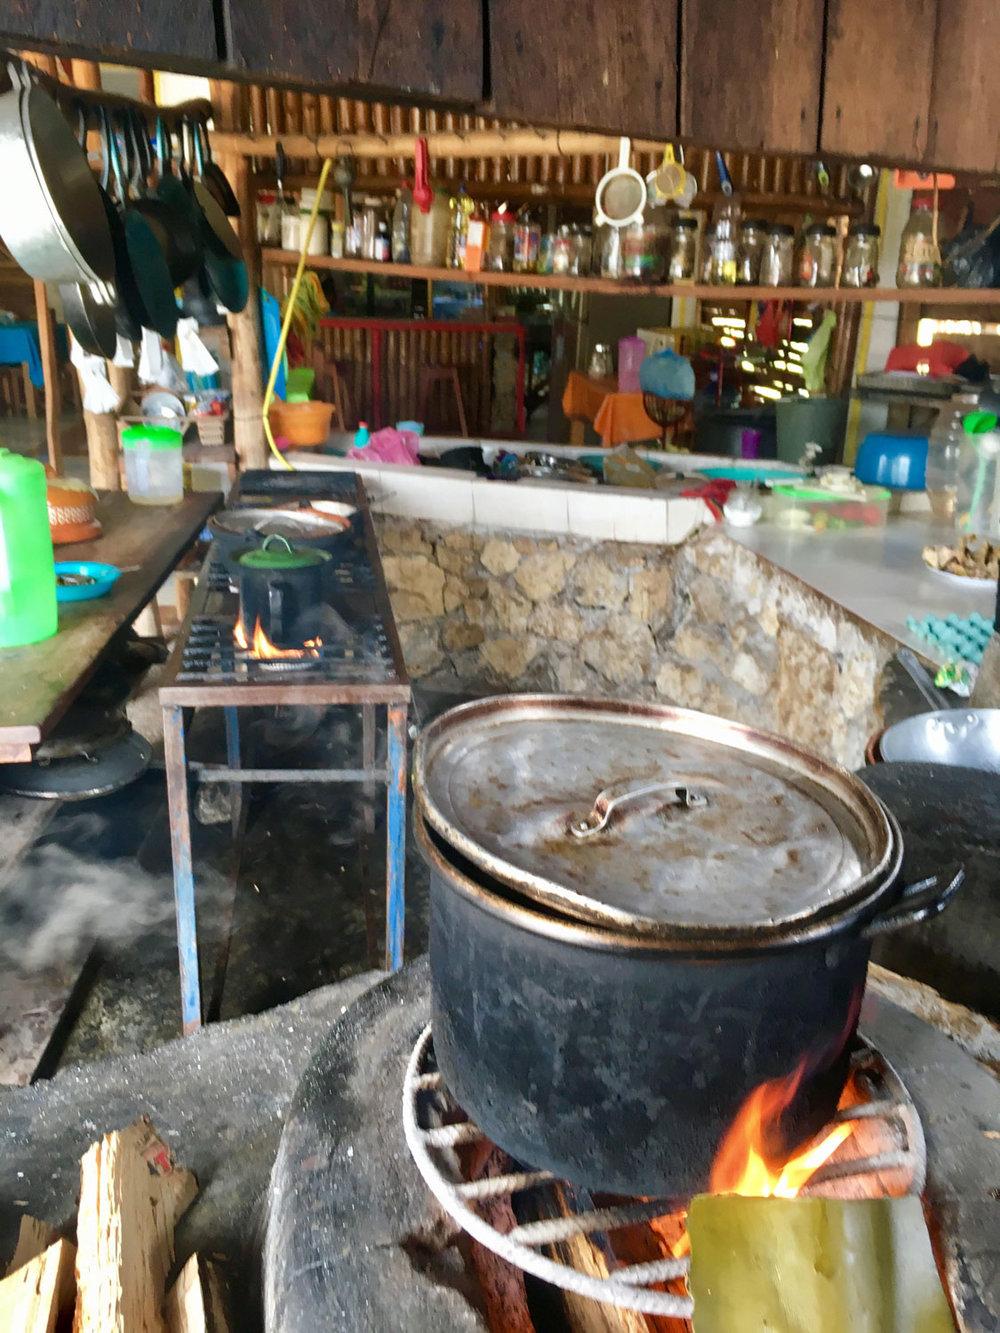 Hammocks_and_Ruins_Blog_Riviera_Maya_Mexico_Travel_Discover_Explore_What_to_do_Jungles_Lacandon_6.jpg